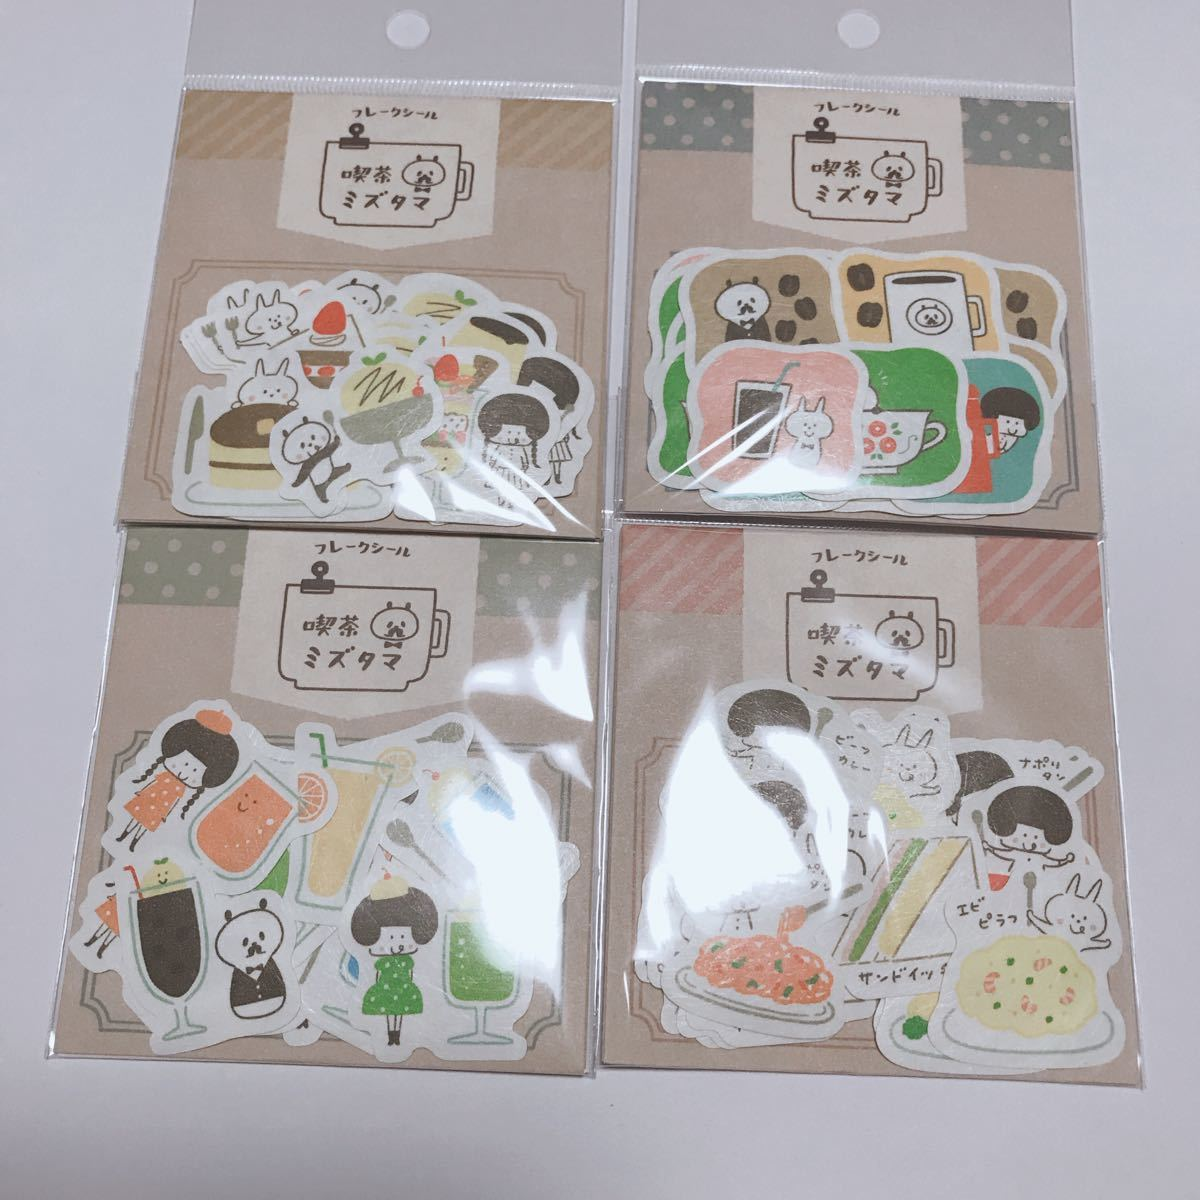 mizutama  喫茶ミズタマ マスキングテープ & フレークシール